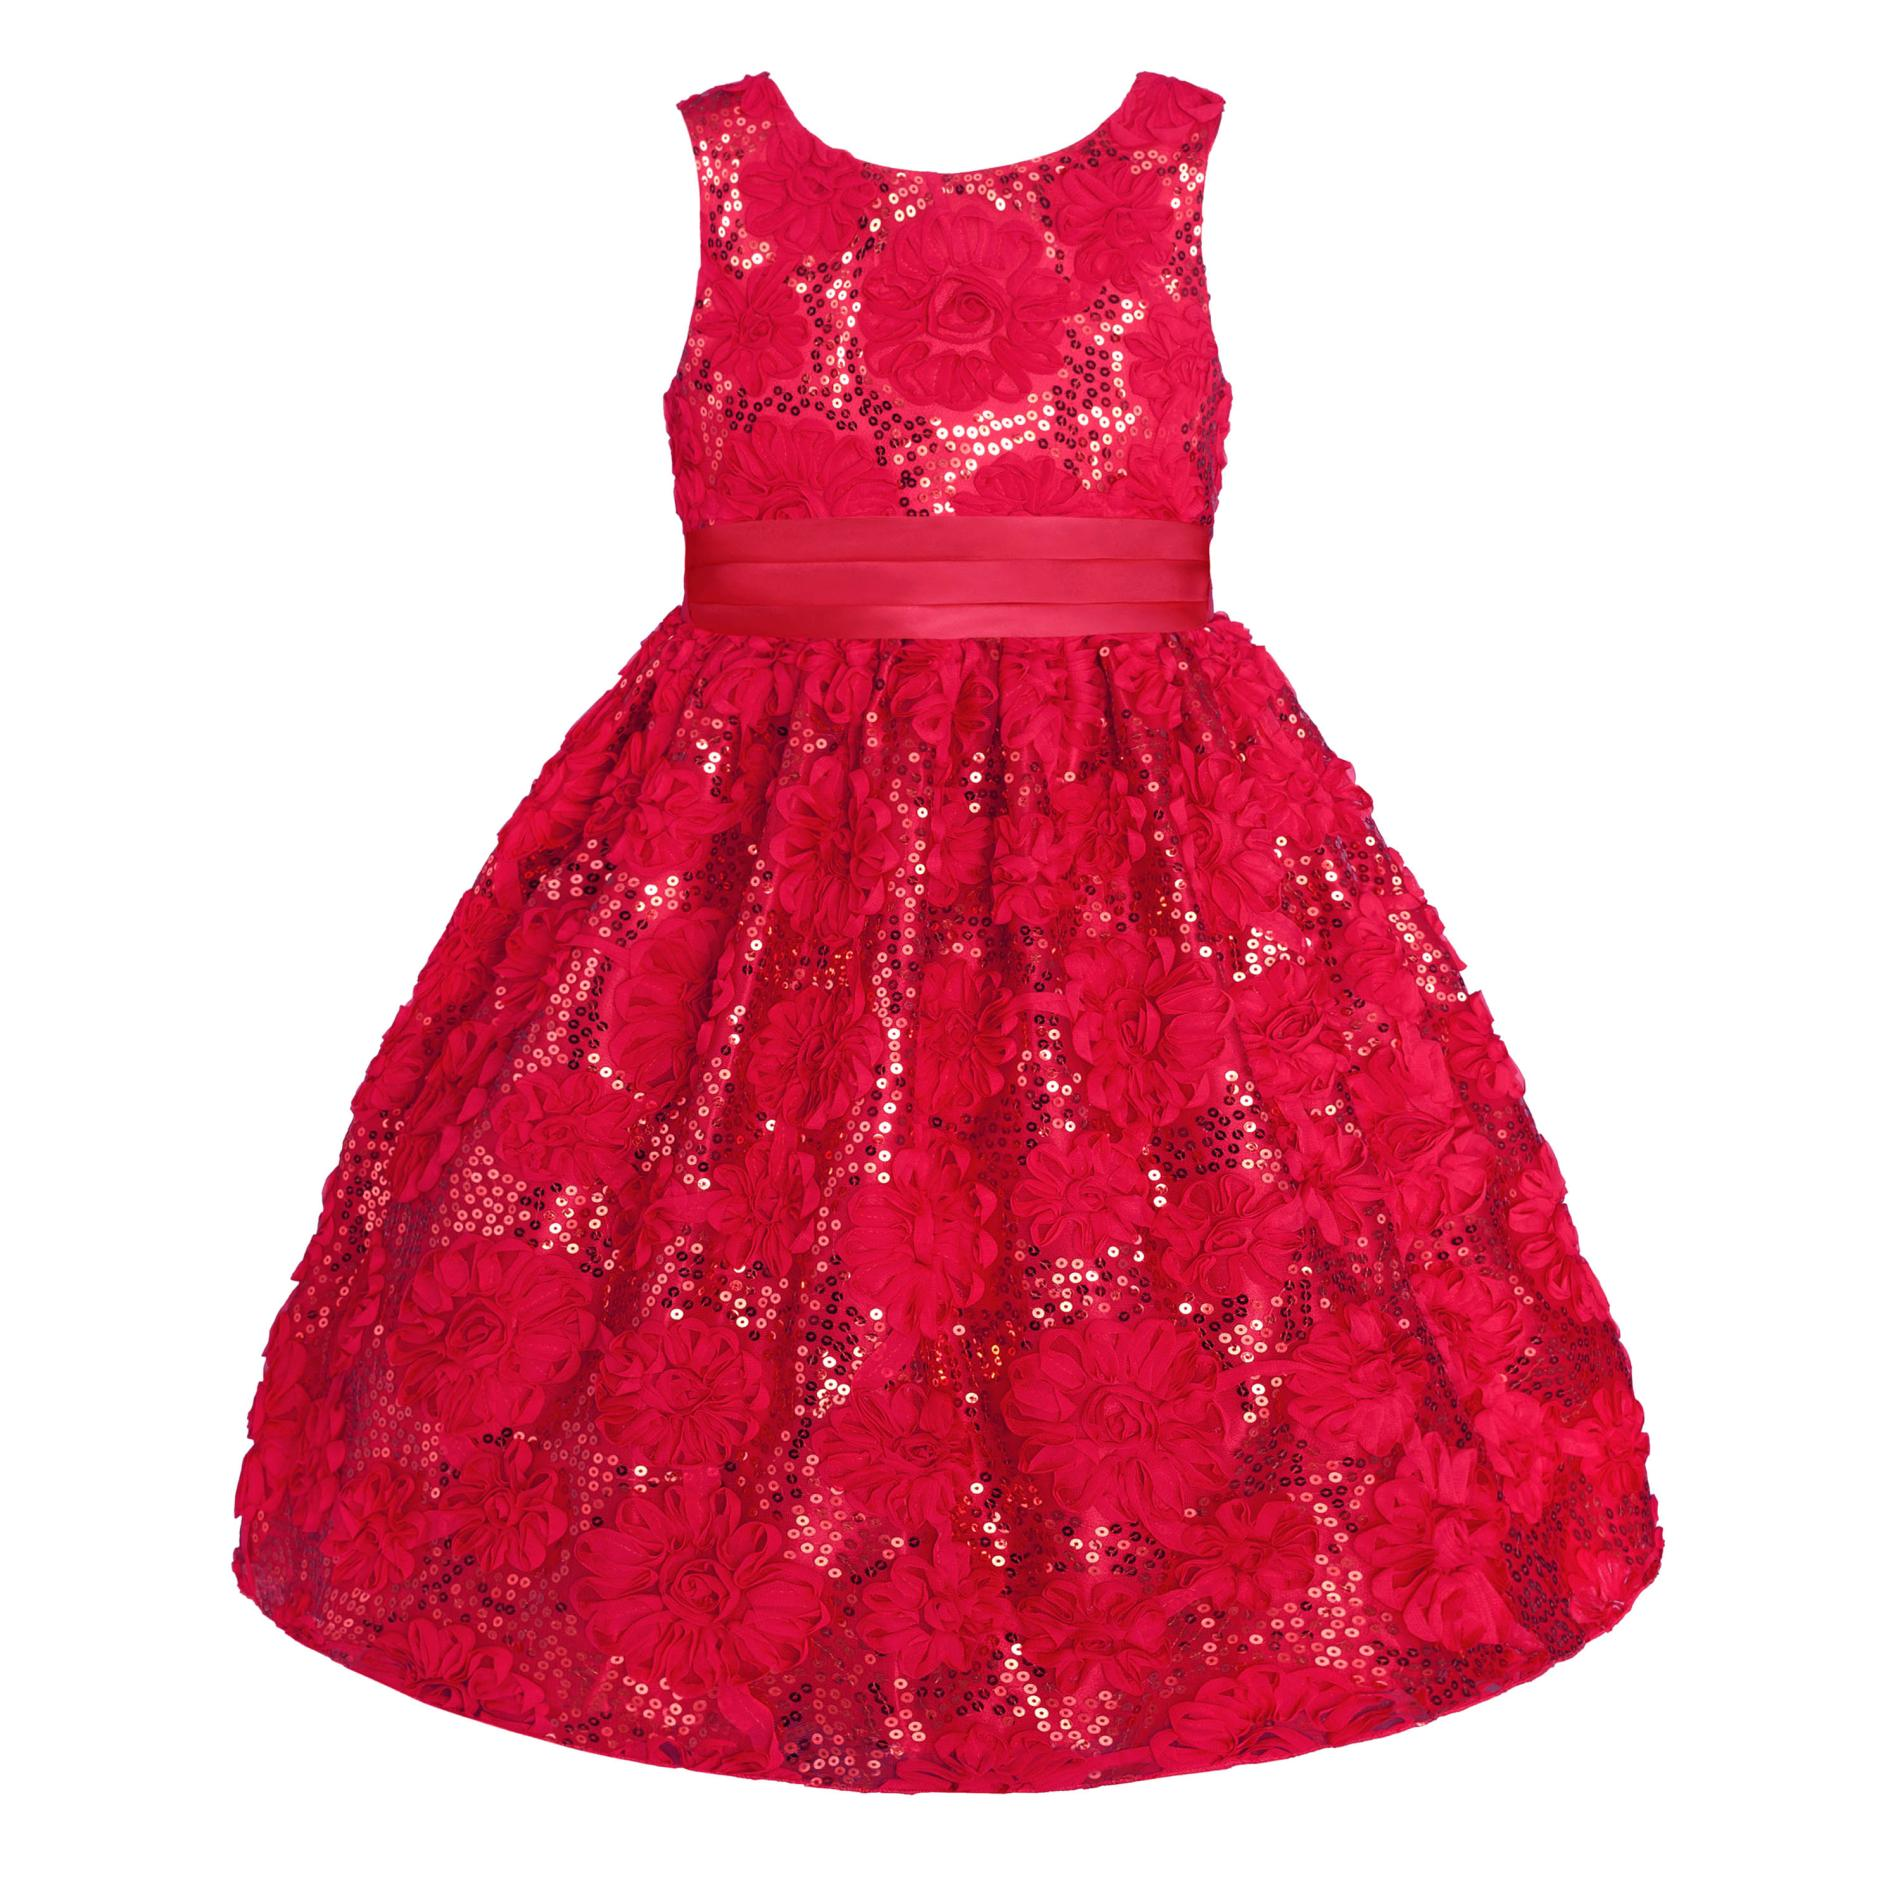 Infant & Toddler Girls' Sequin Occasion Dress